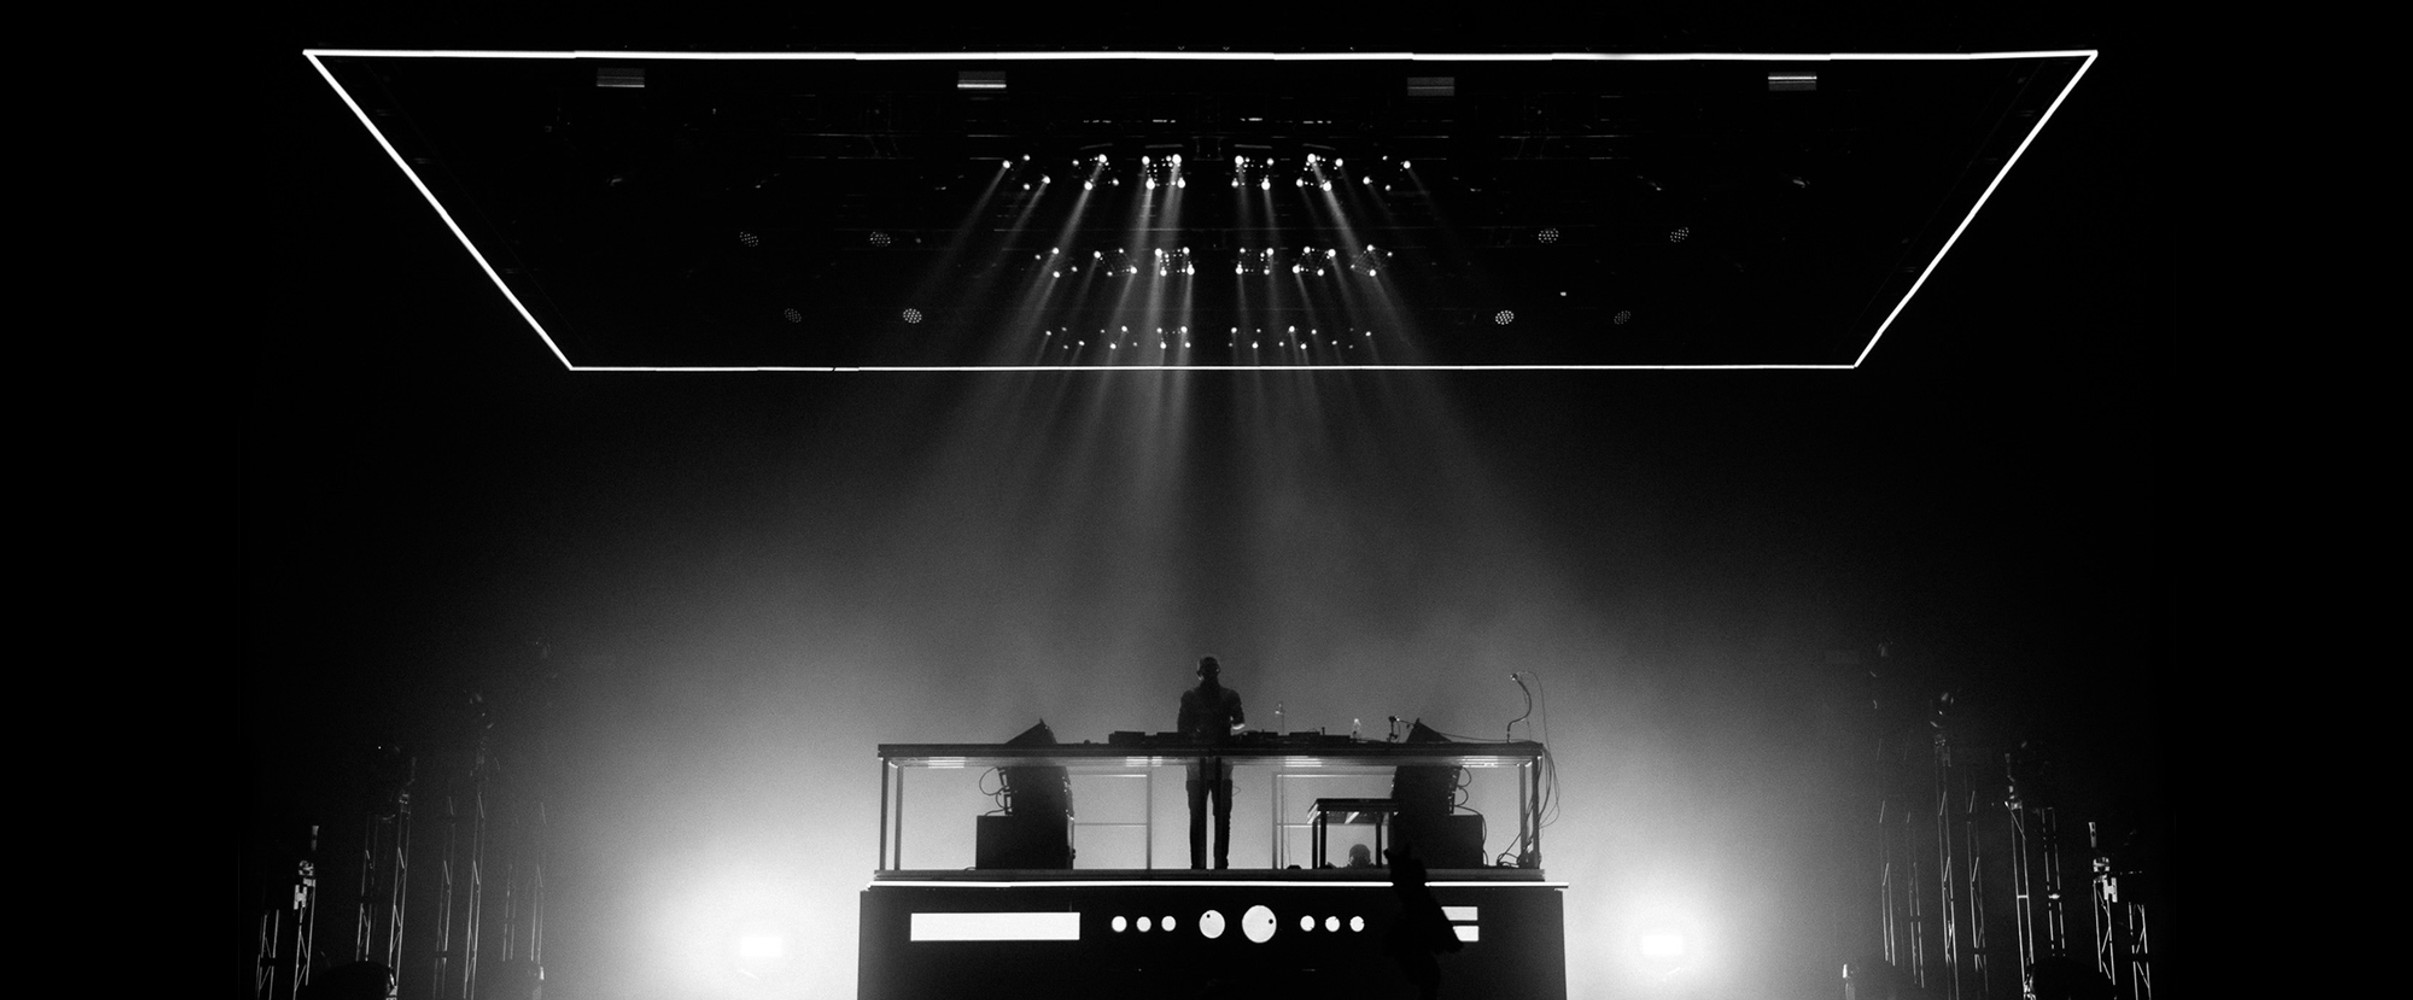 Dillon Francis - Lost My Mind Tour